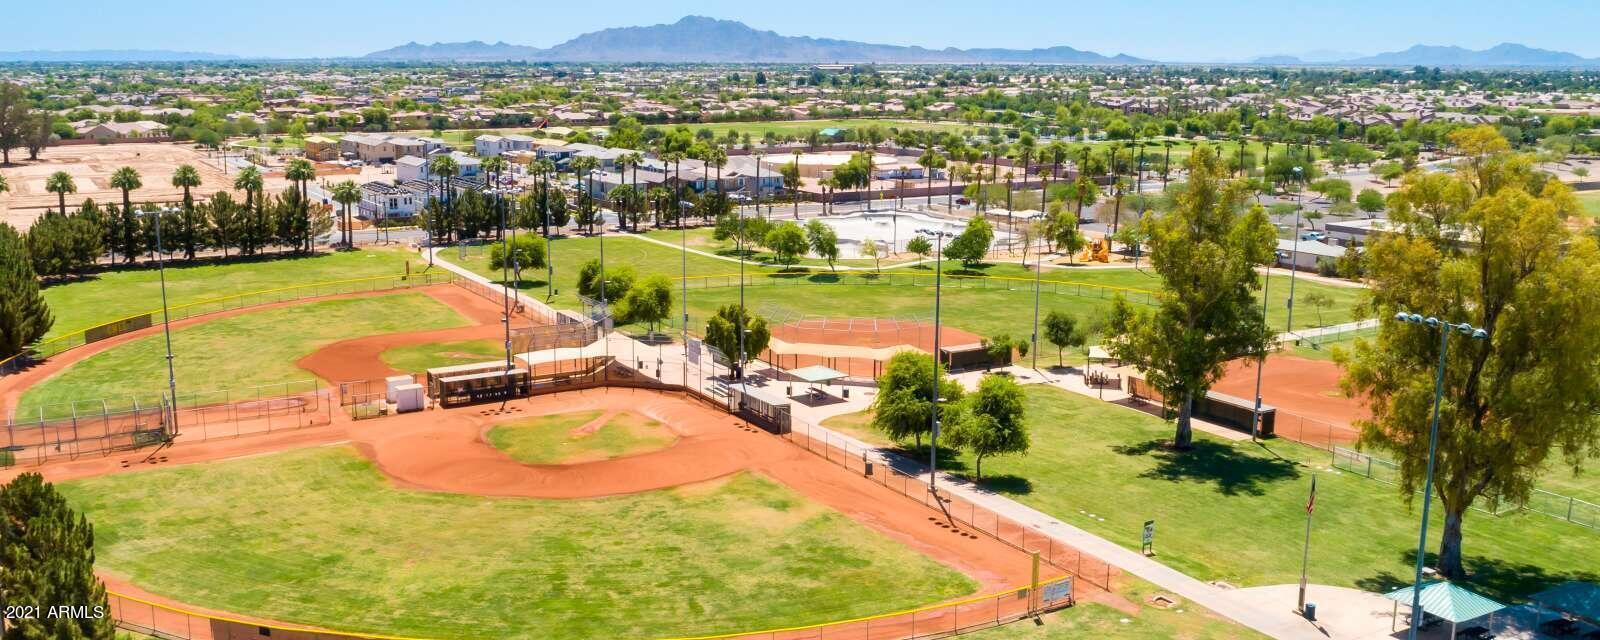 MLS 6287820 2166 W PENINSULA Circle, Chandler, AZ 85248 Chandler AZ Ocotillo